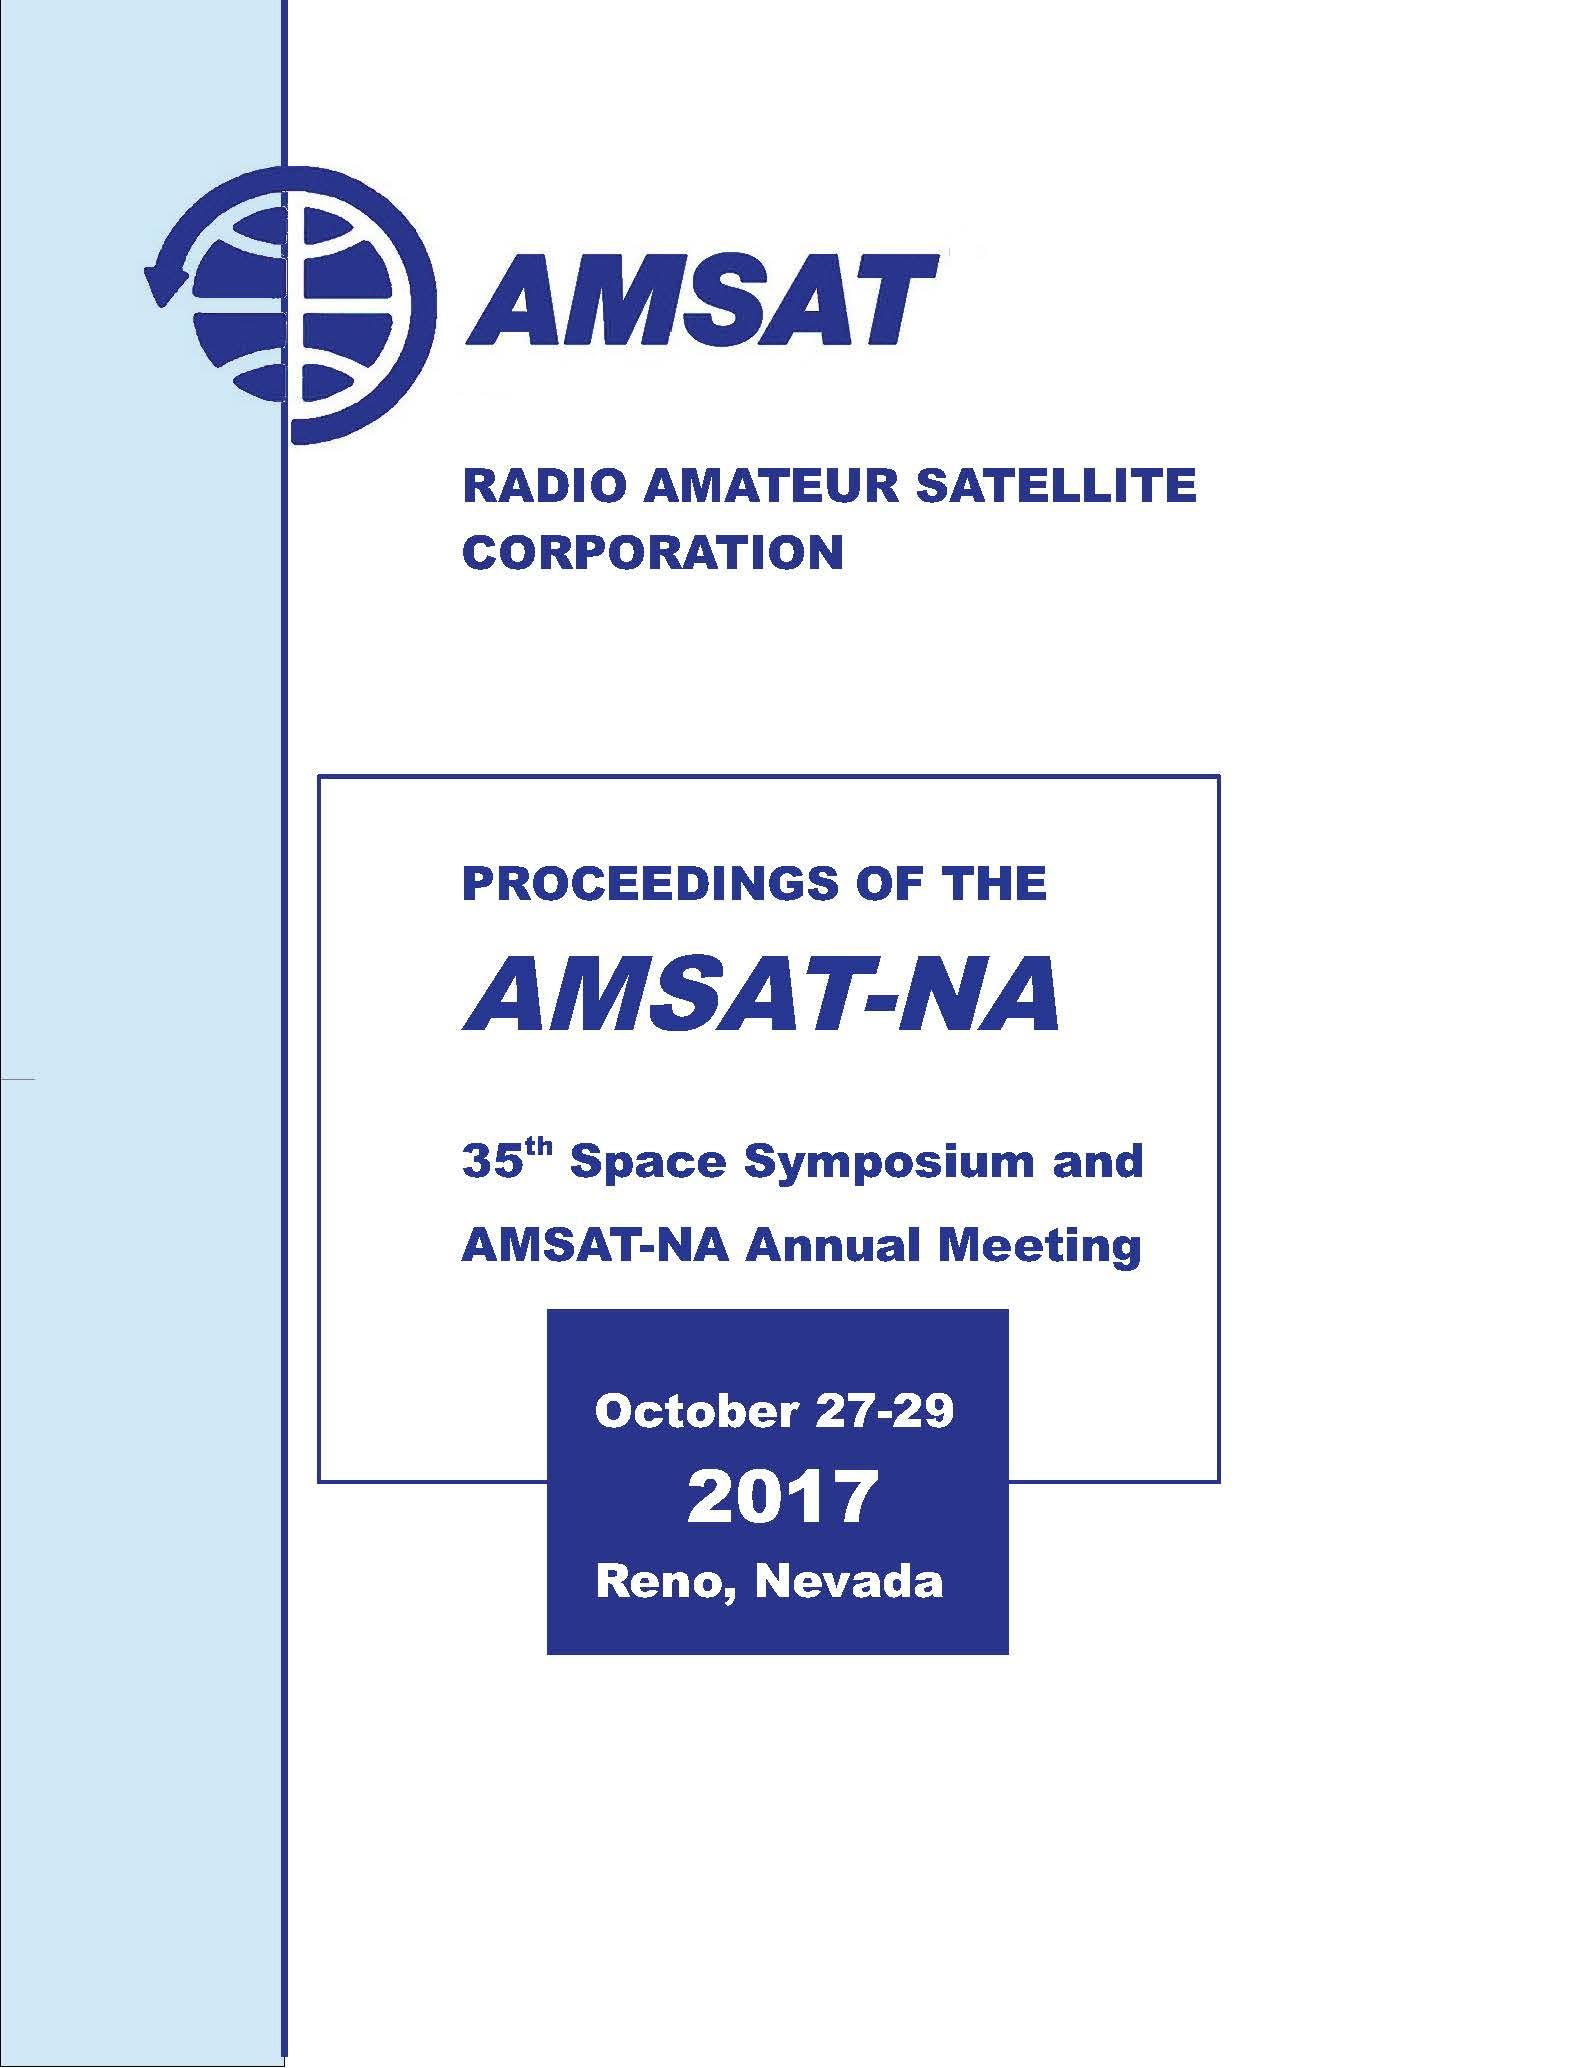 2017 Amsat Symposium Proceedings  U2013 Digital Download  U2013 Amsat